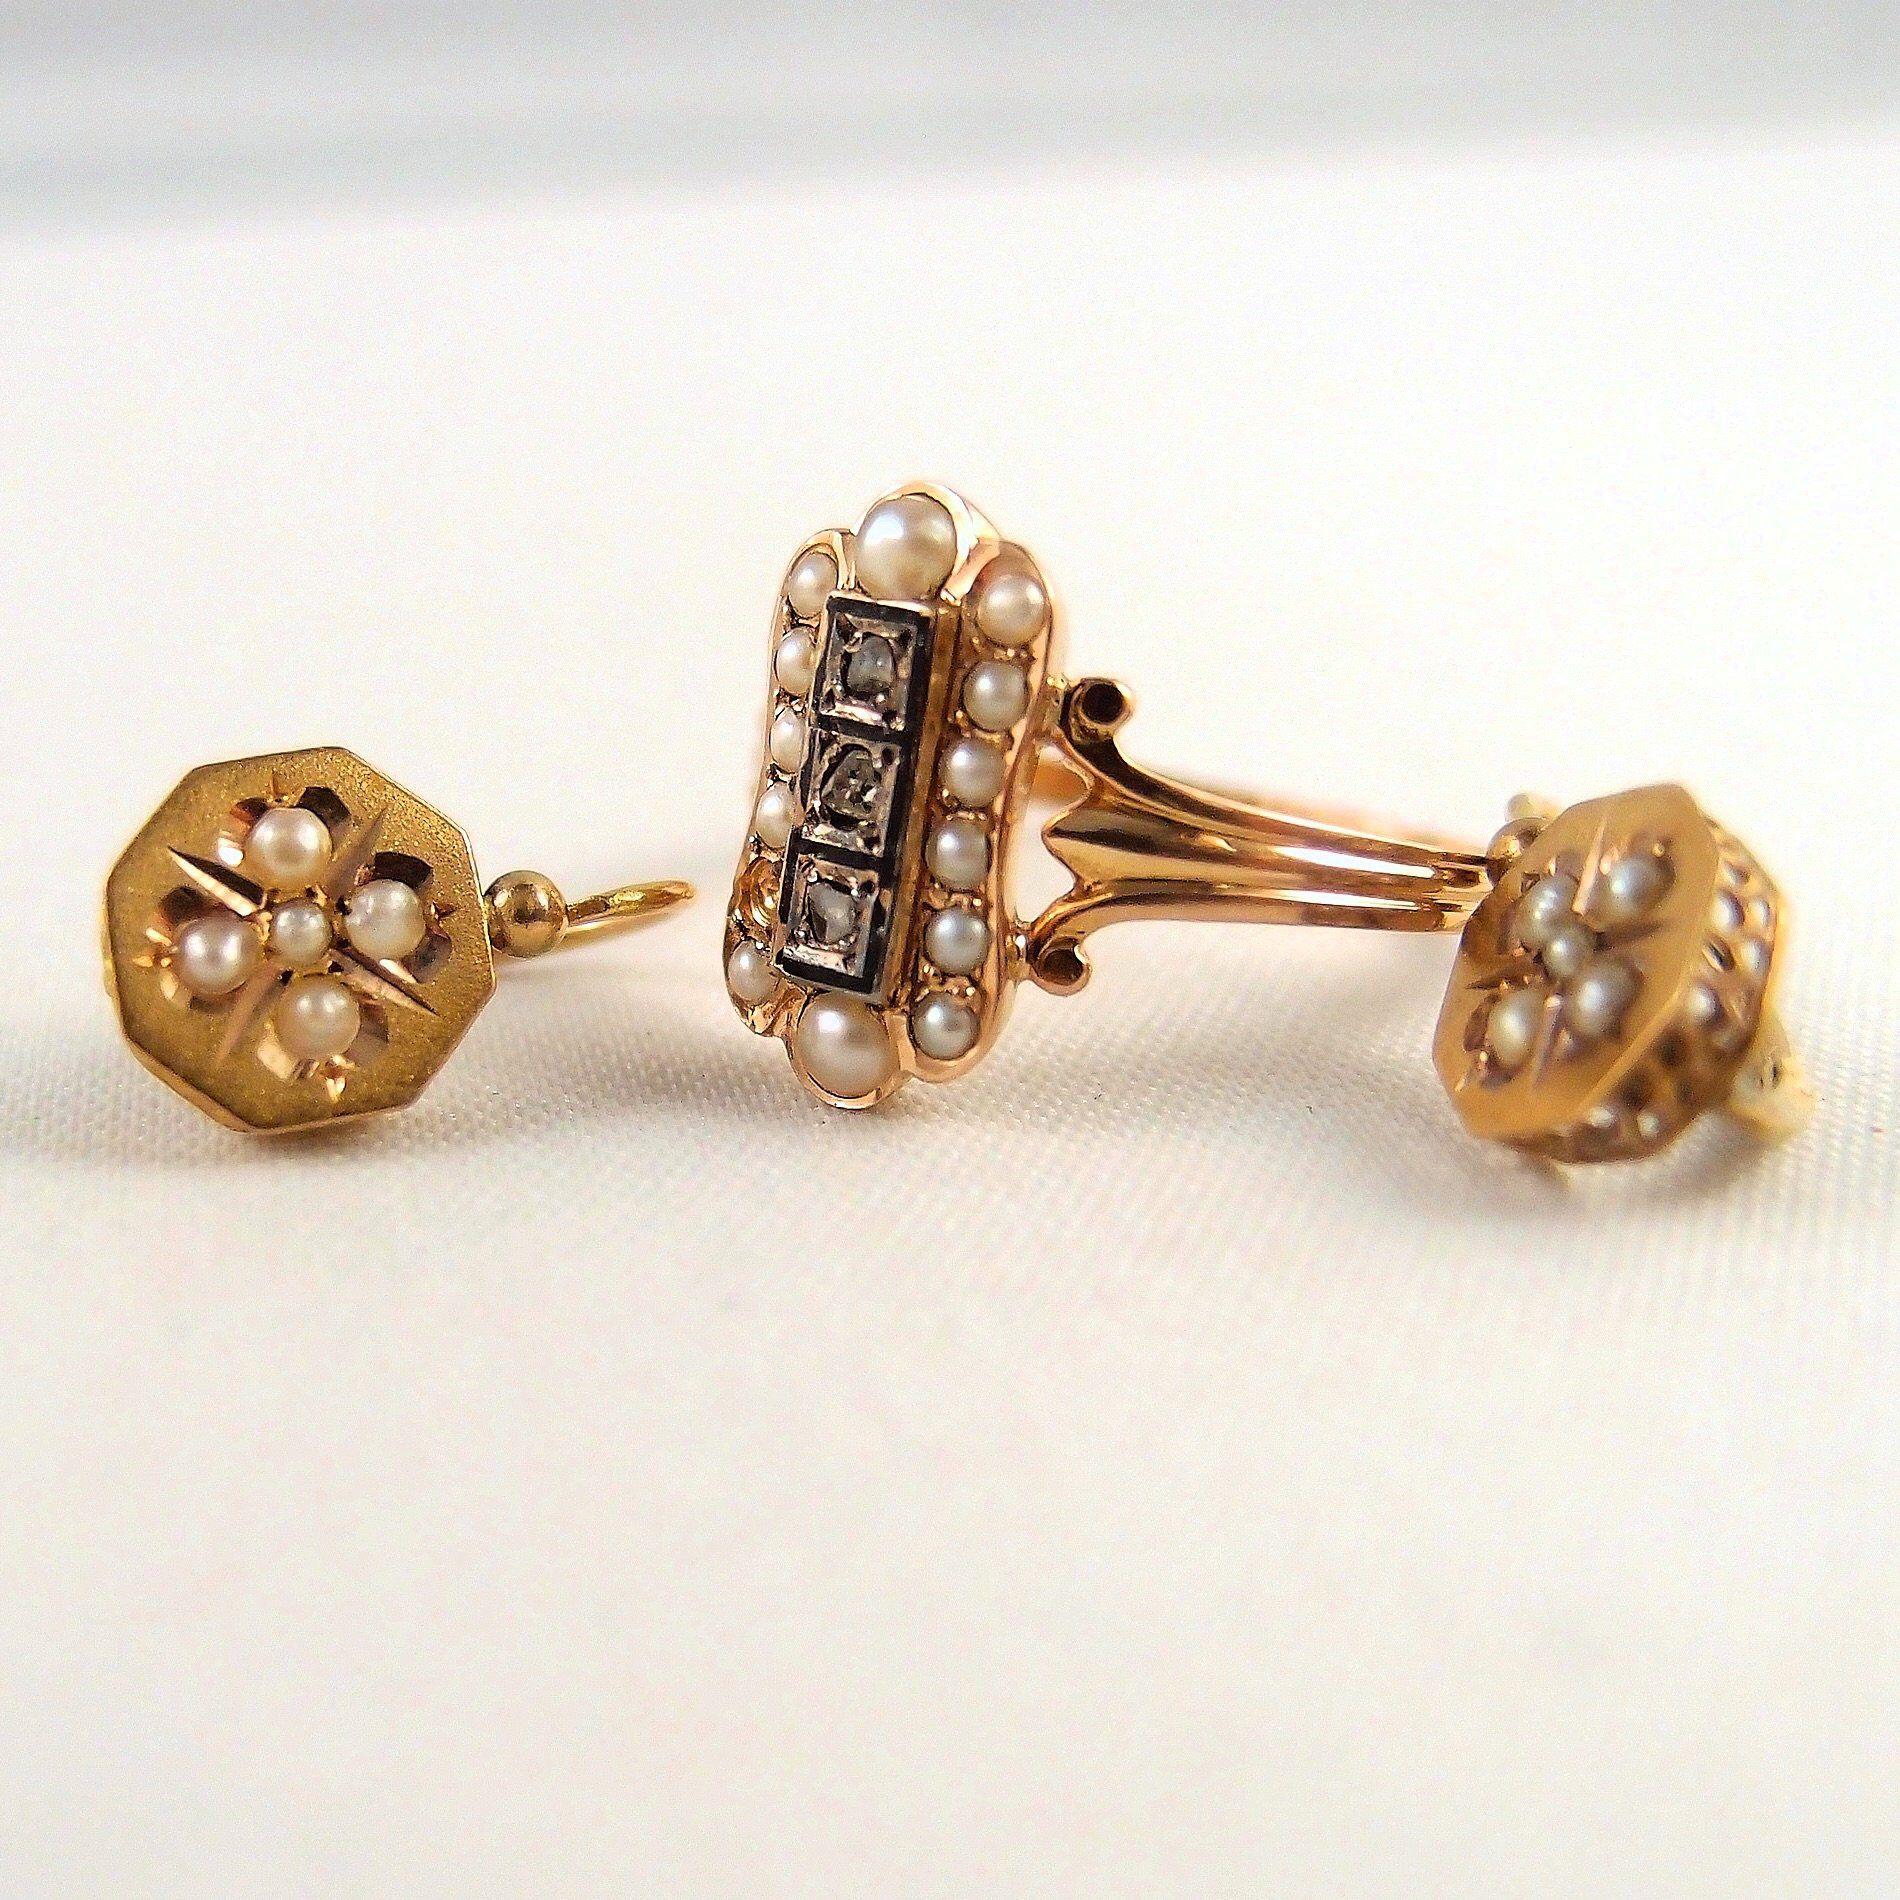 1c09207b61e9d Elegant Victorian era 18K solid gold fine jewelry set Stamped gold ...